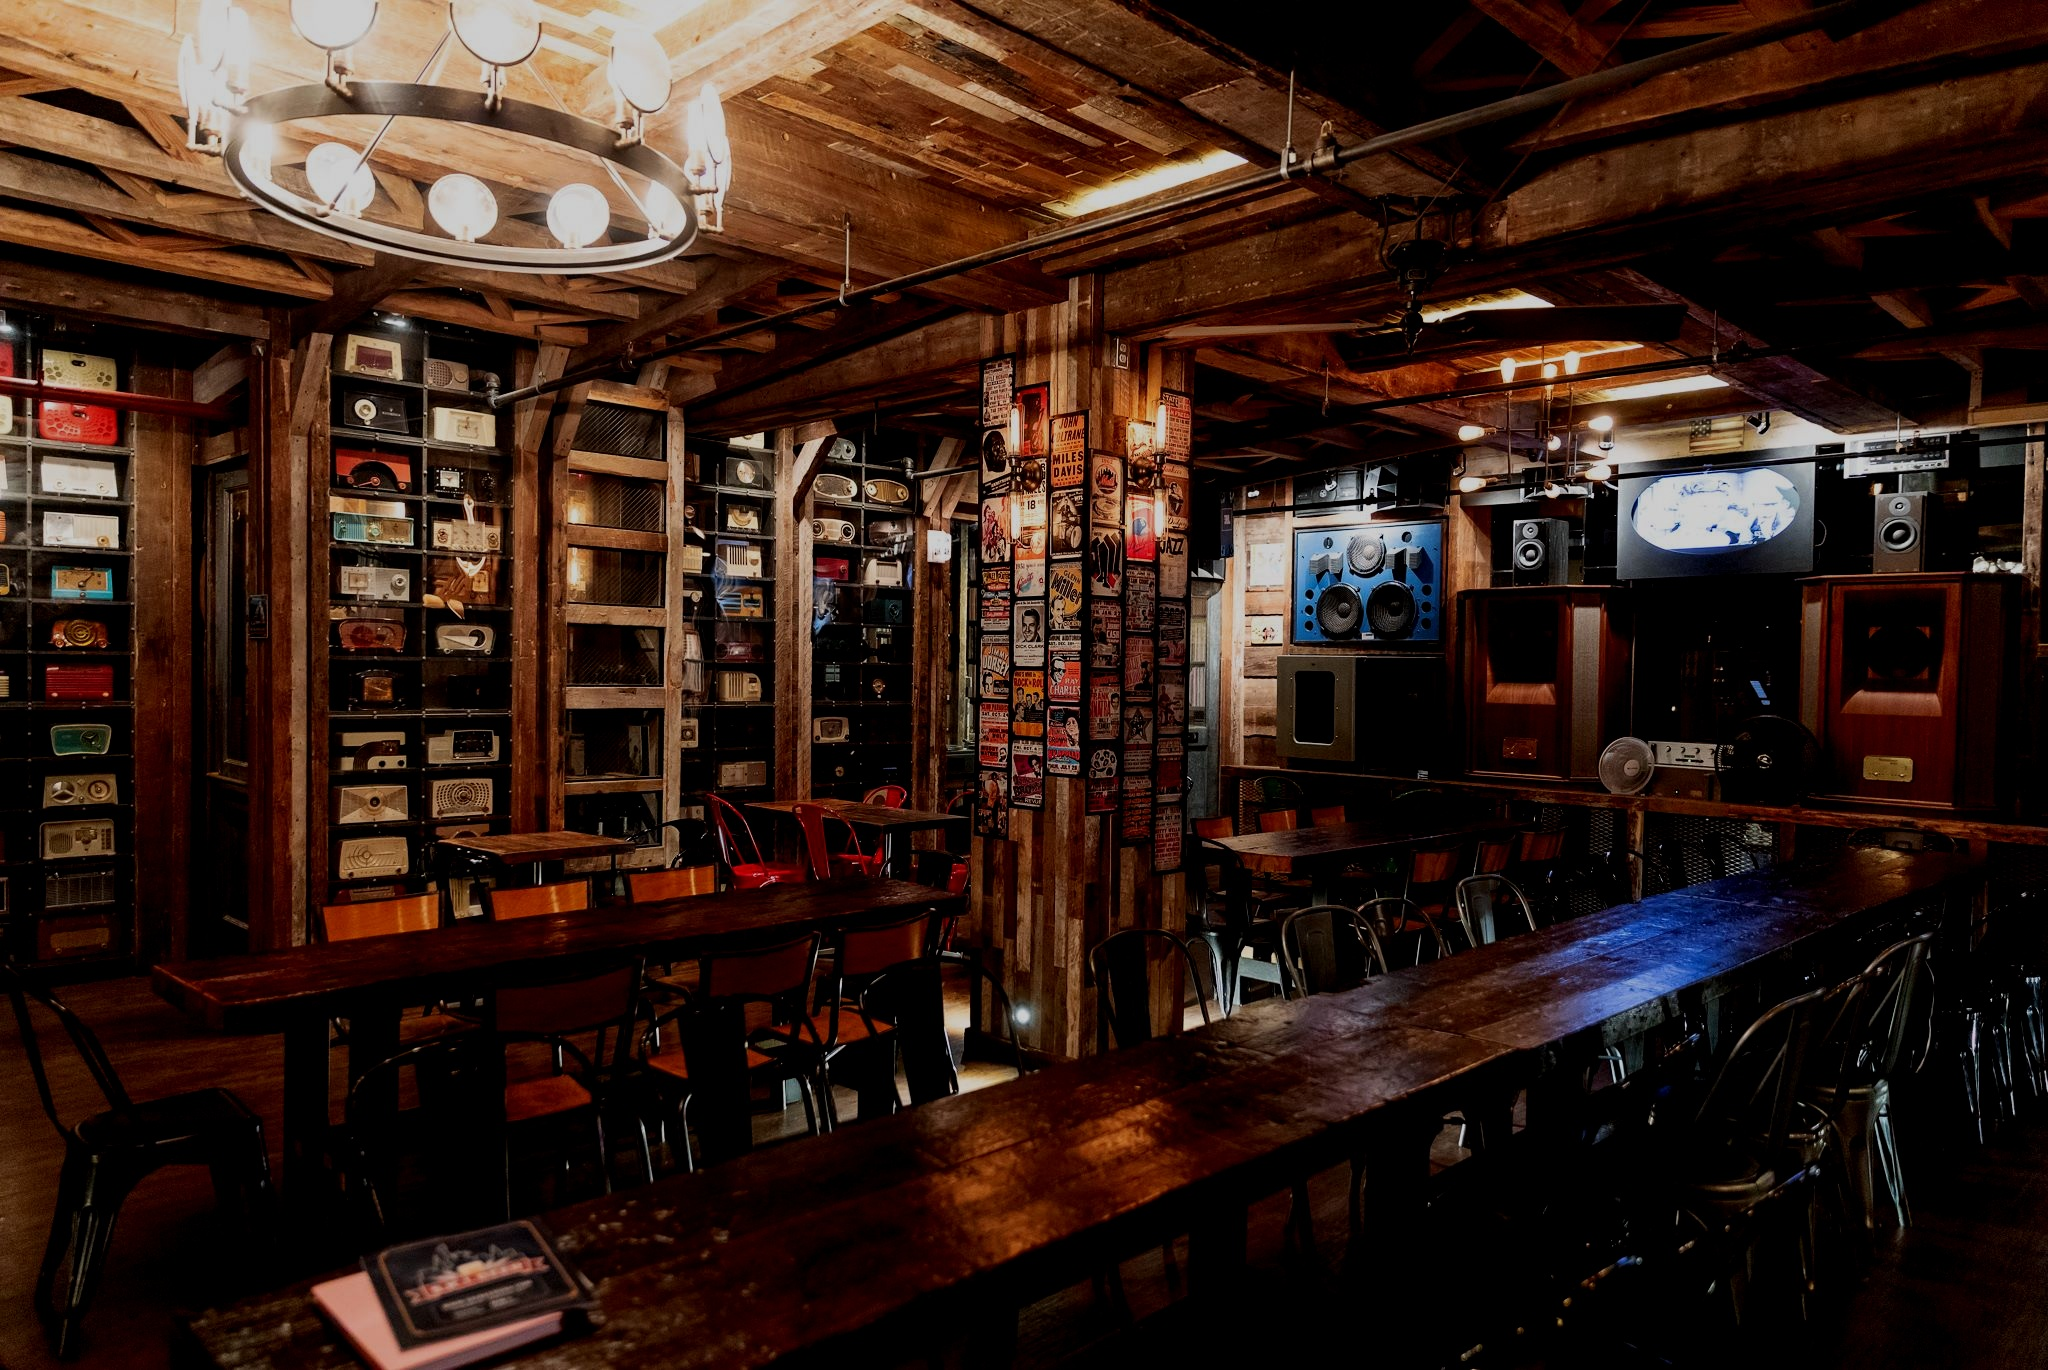 Turntable LP Bar Karaoke - 34-36 W 32nd Street (212) 594-4344